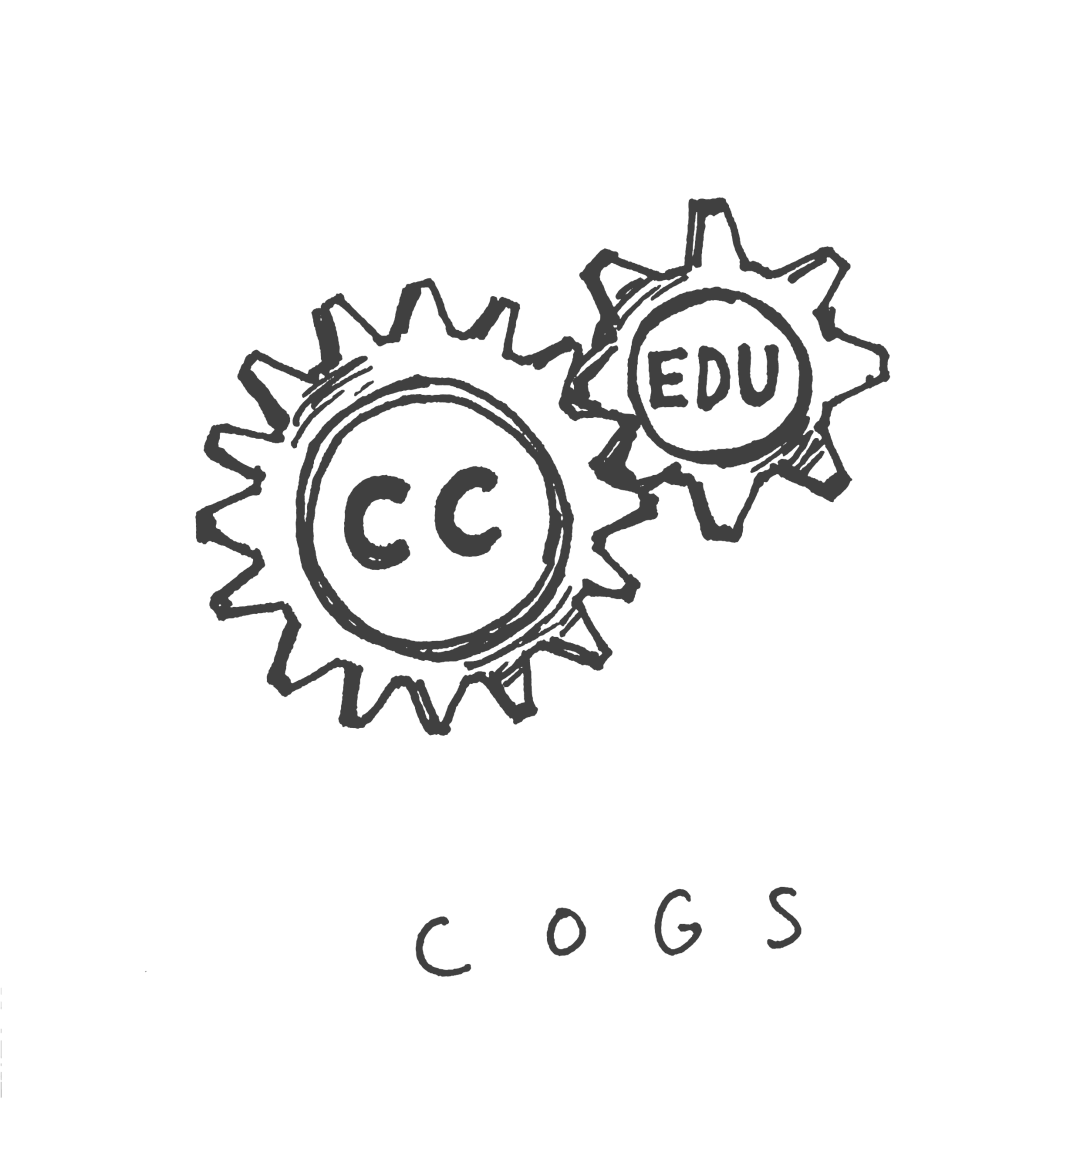 CC sketch cogs